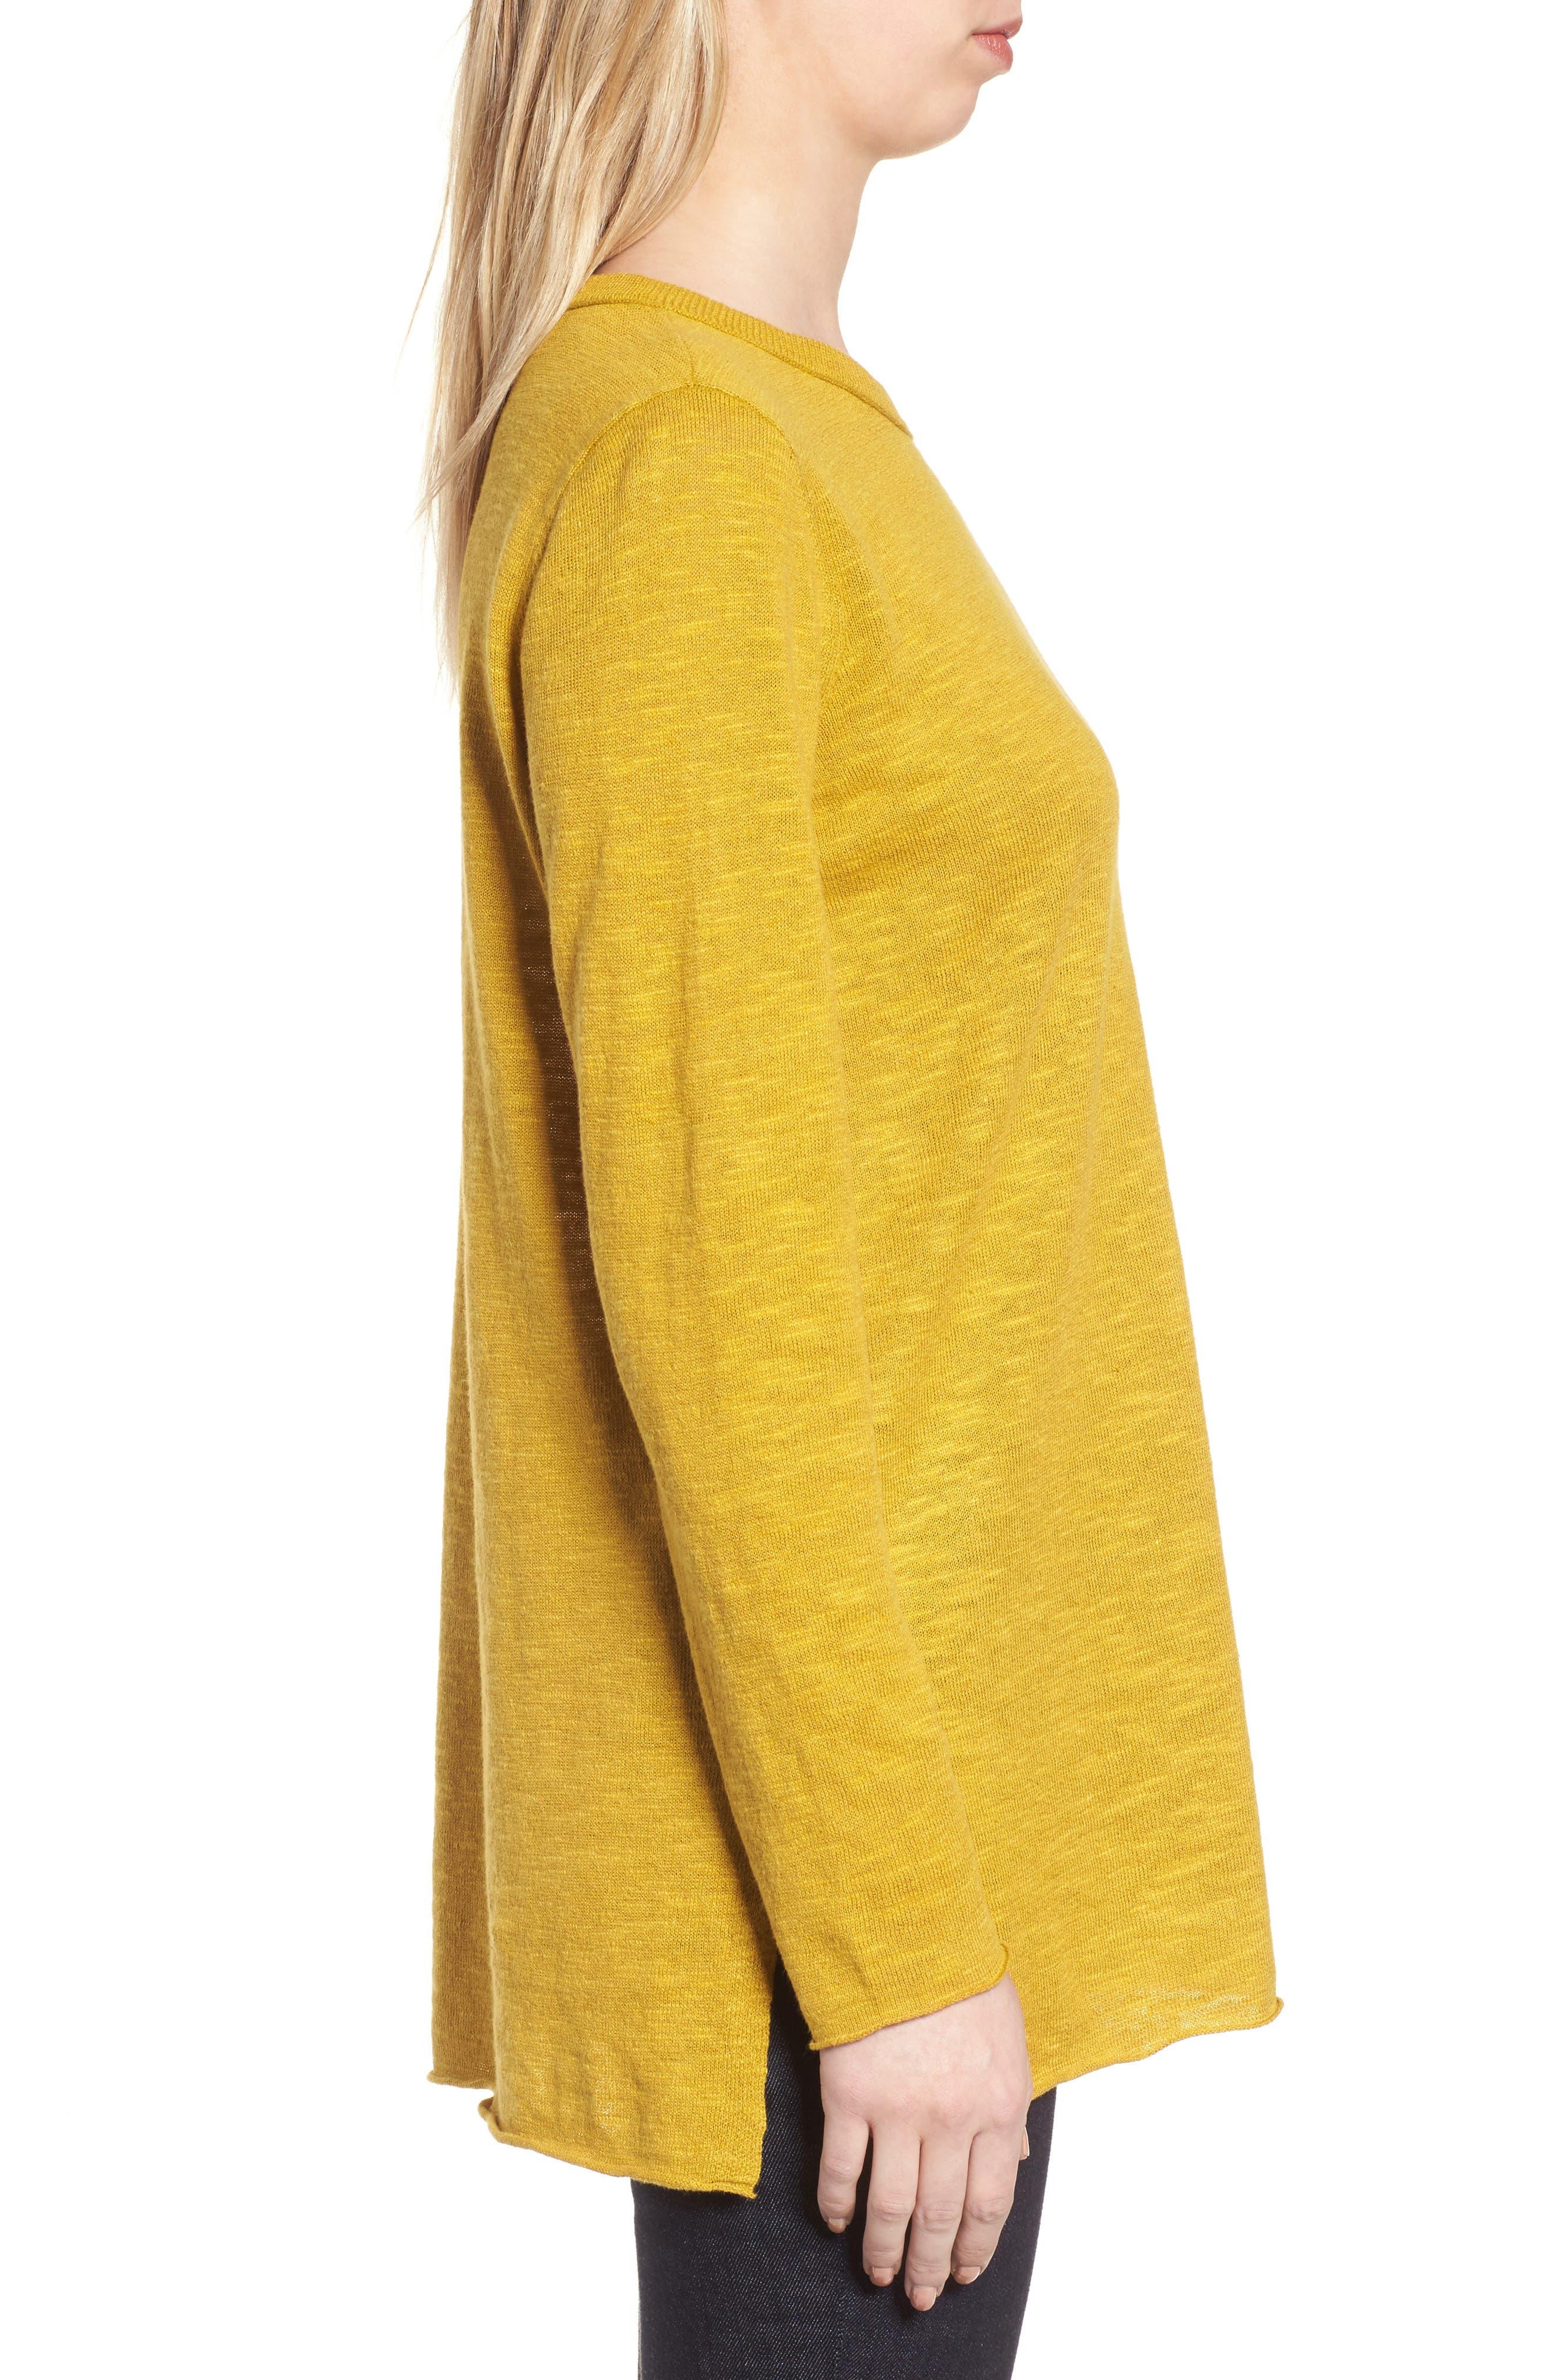 Organic Knit Crewneck Tunic Top,                             Alternate thumbnail 3, color,                             Mustard Seed